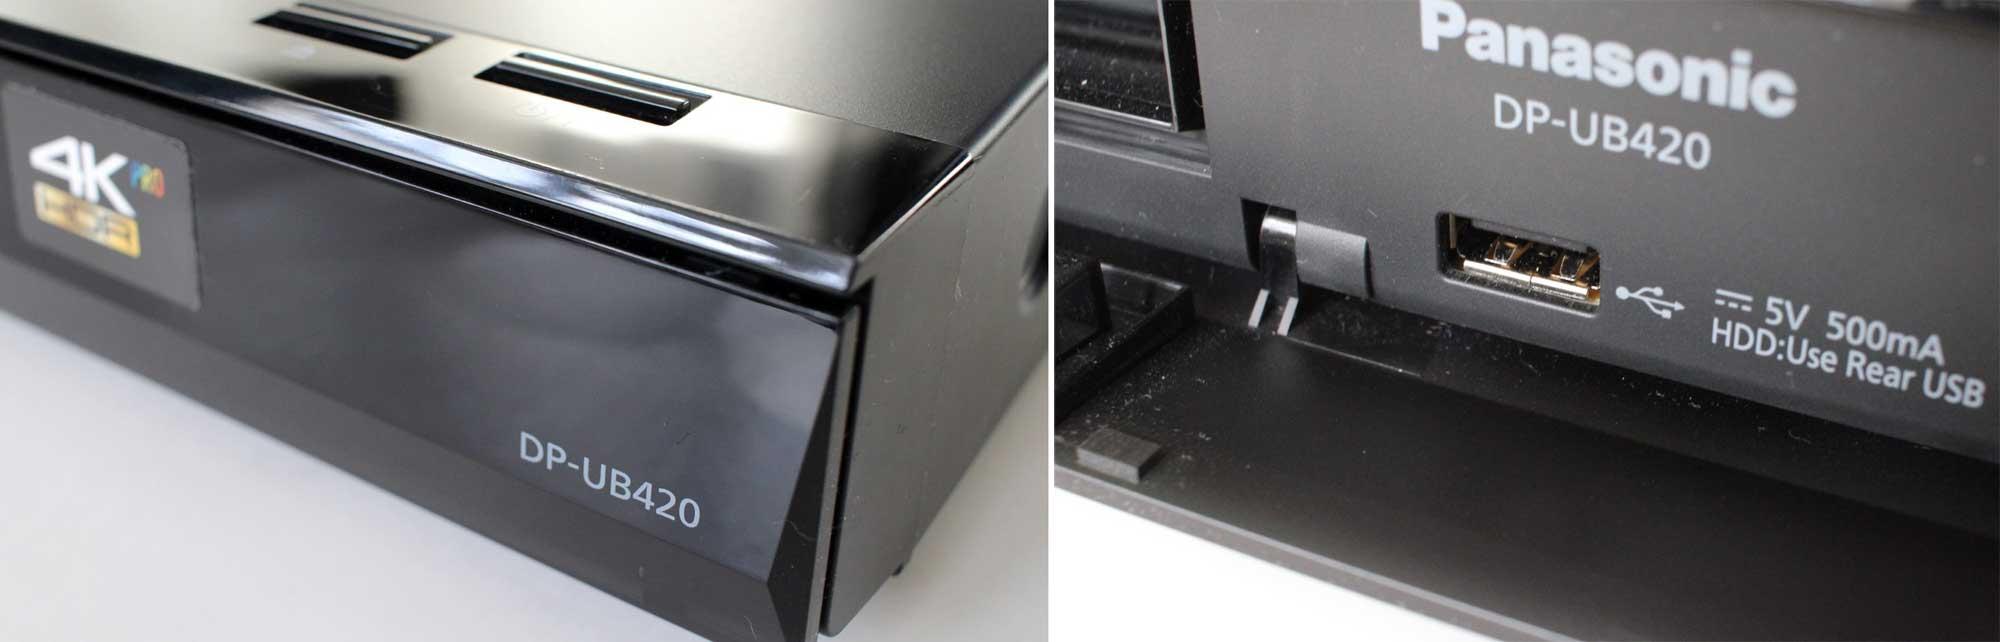 Panasonic DP-UB420 обзор